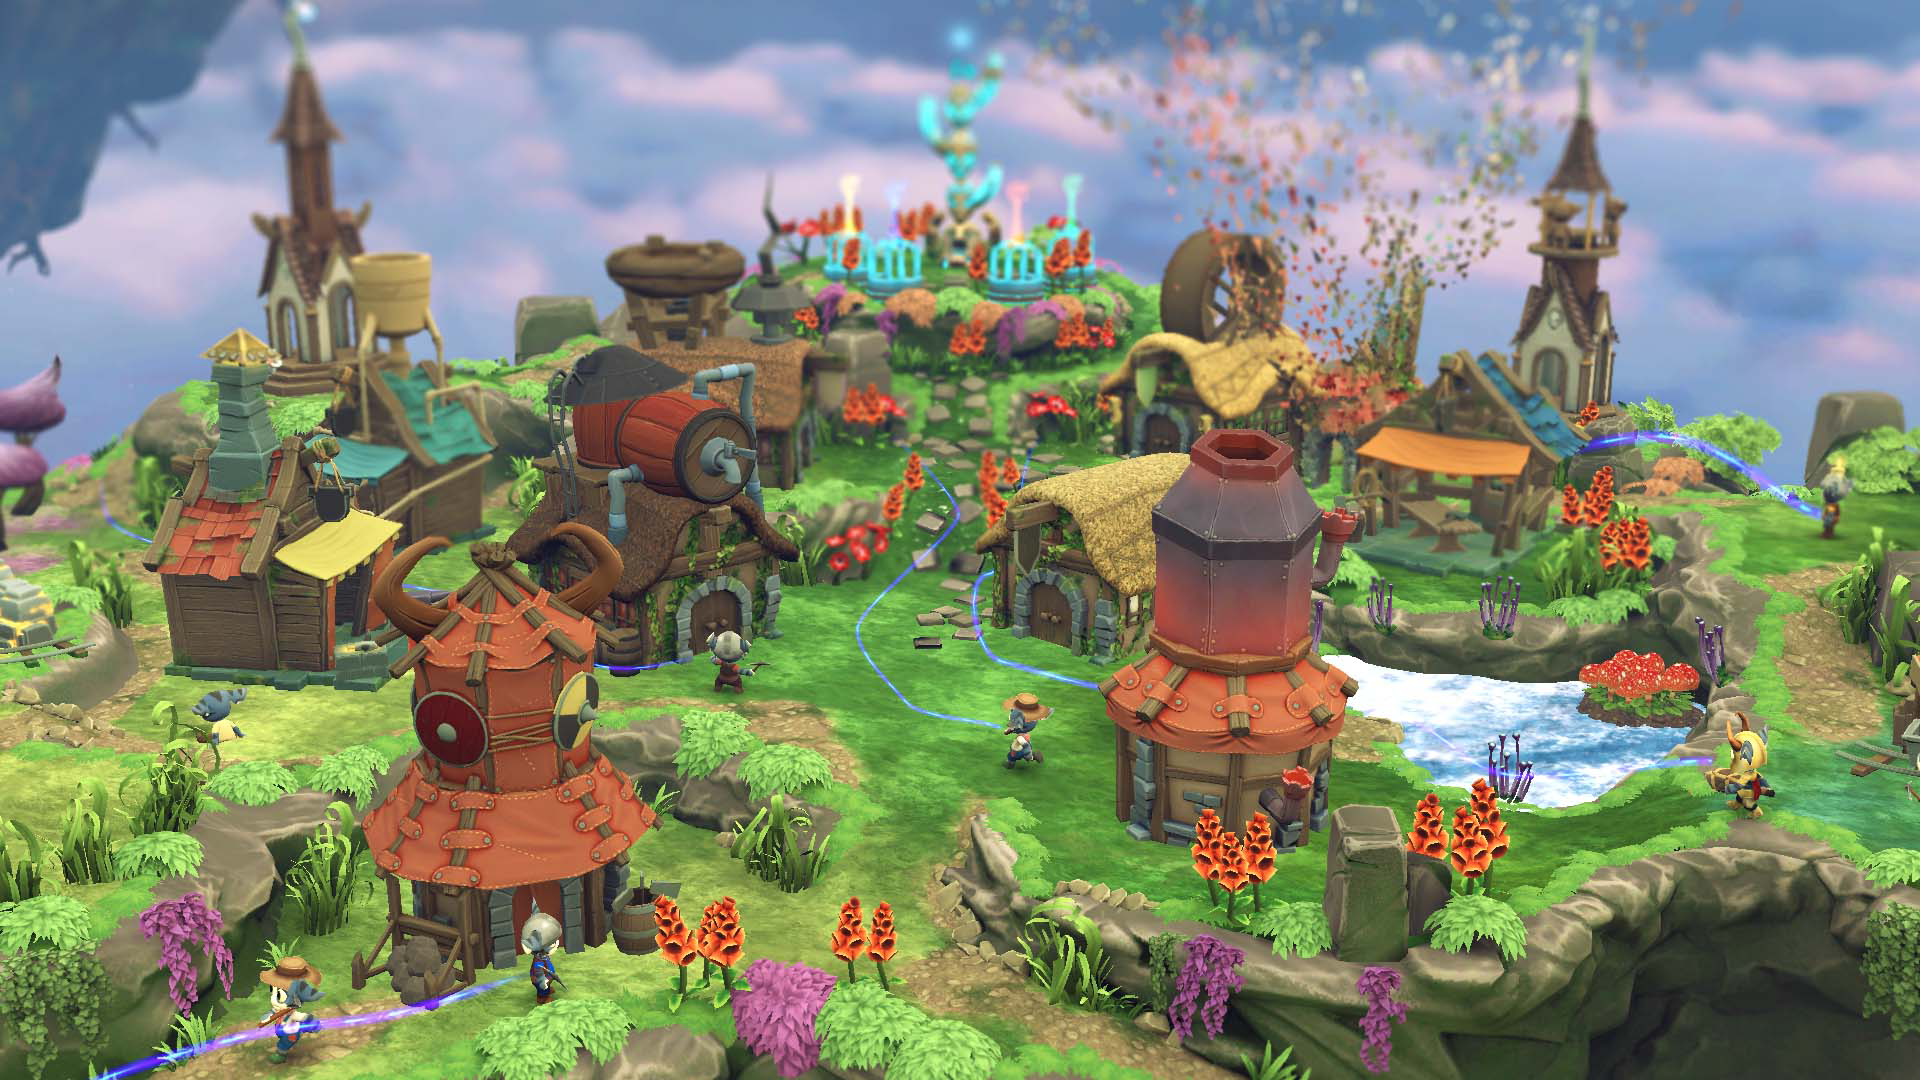 『Tethered』ゲーム画面